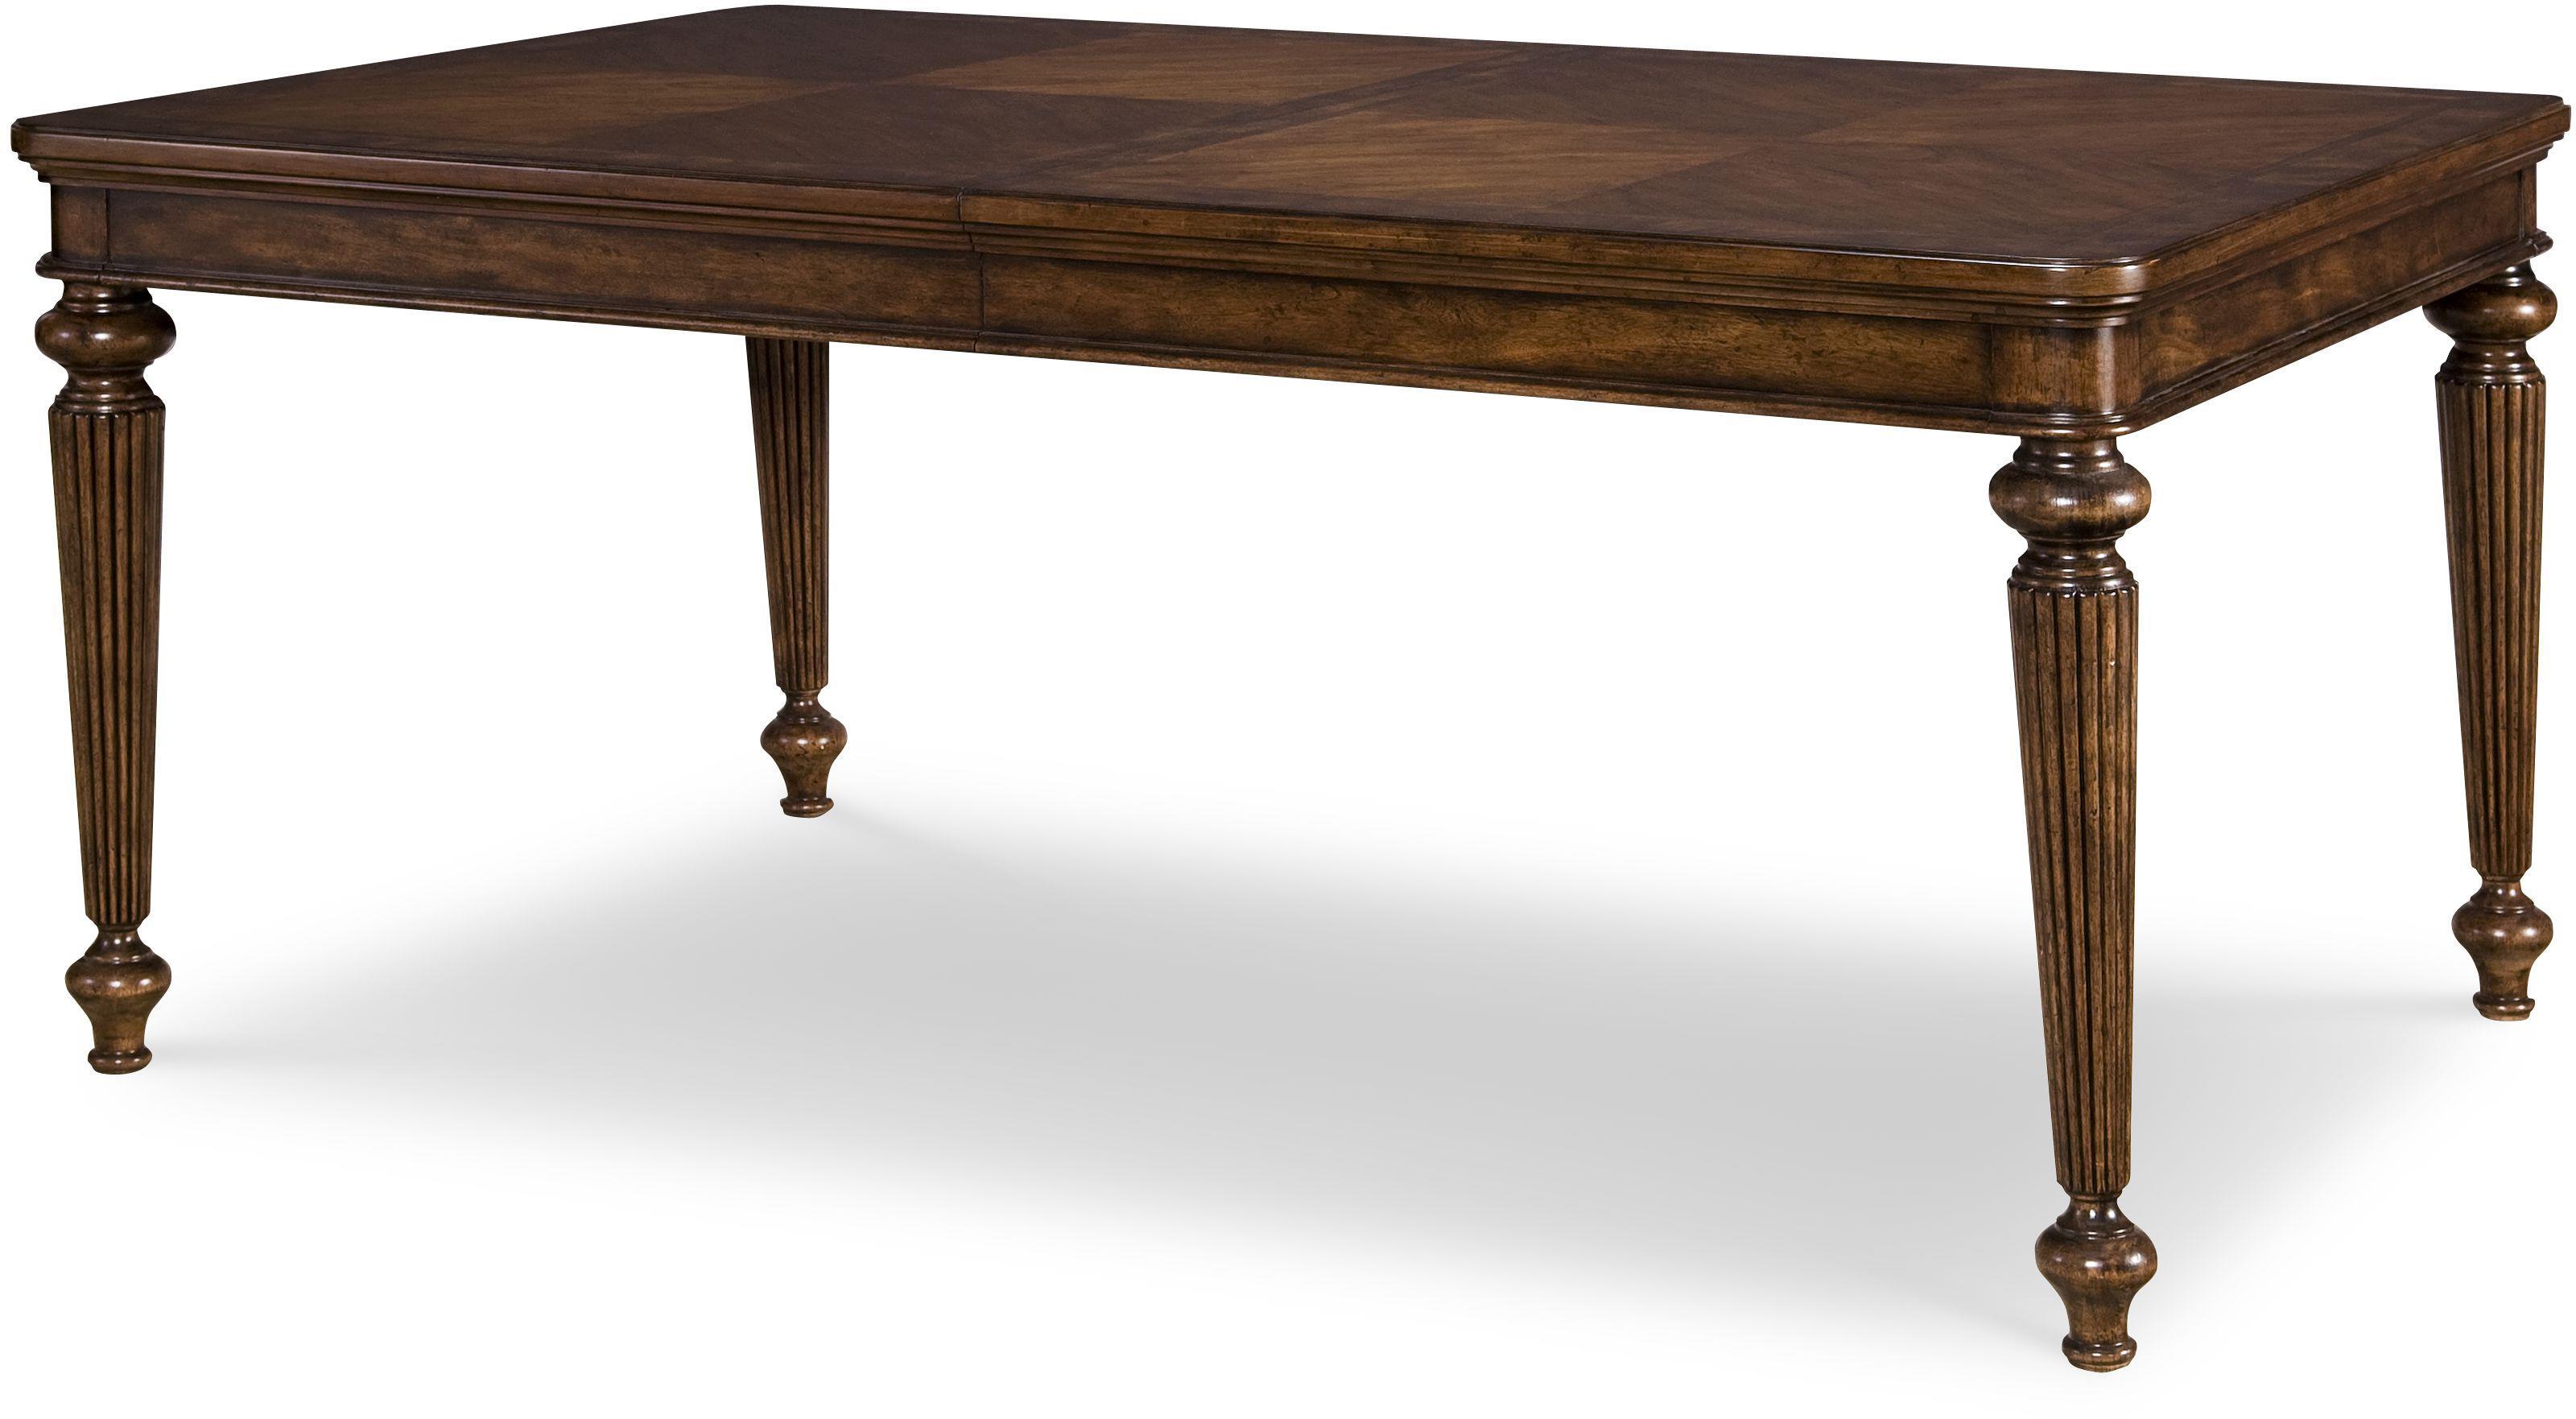 Legacy Classic Barrington Farm Rectangular Leg Table  - Item Number: 5200-222